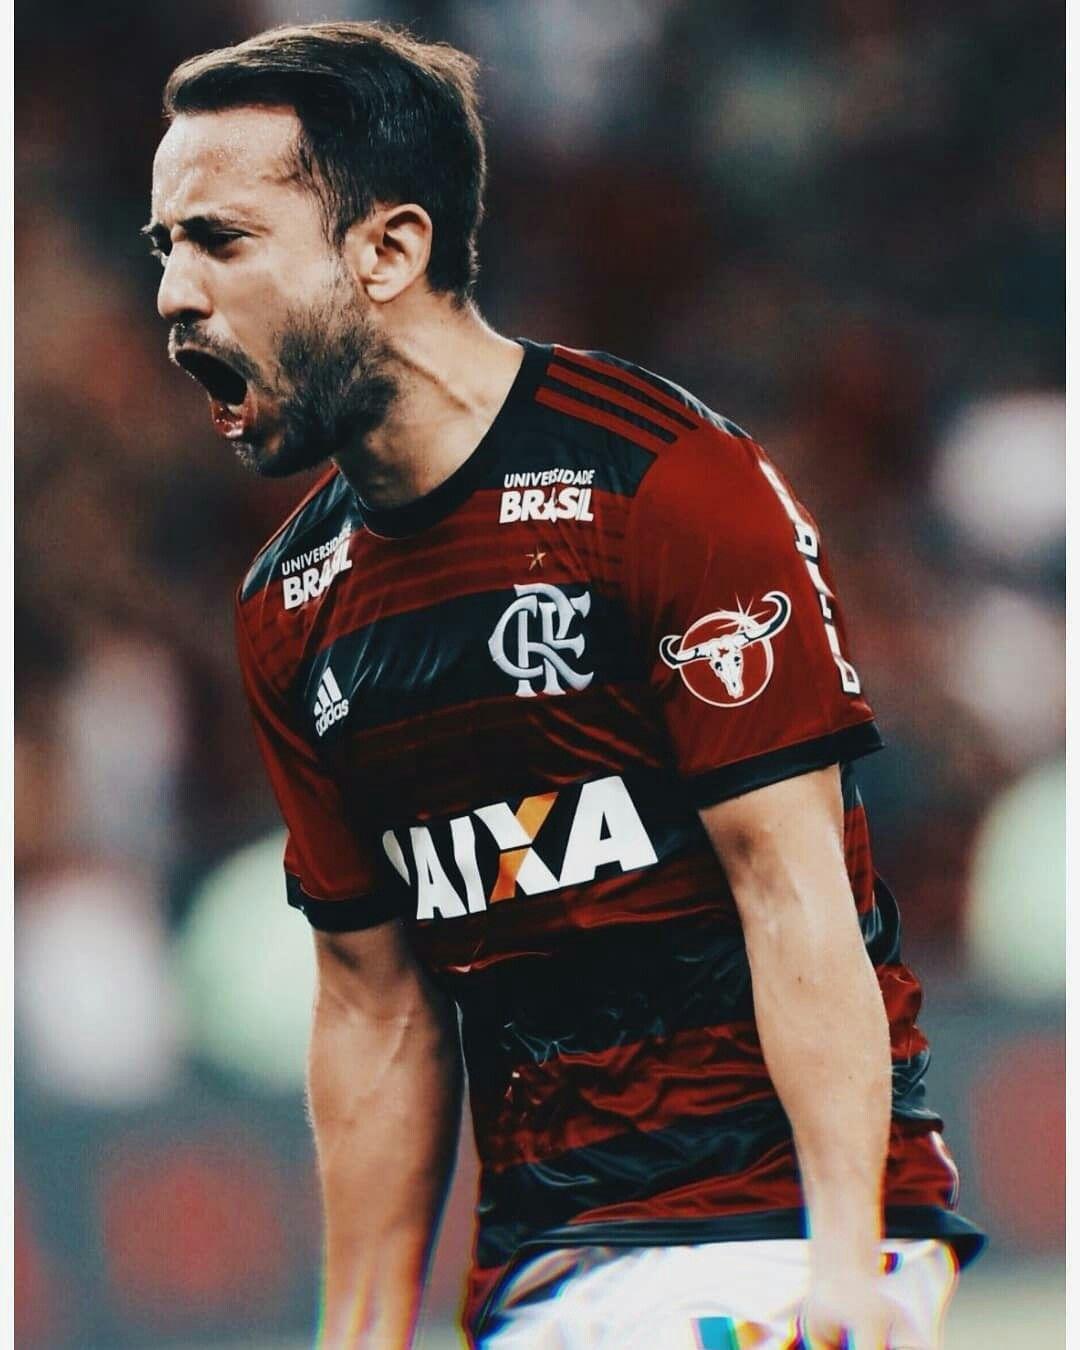 Everton Ribeiro 🔴⚫ Libertadores 2019 Flamengo 3 x 1 LDU